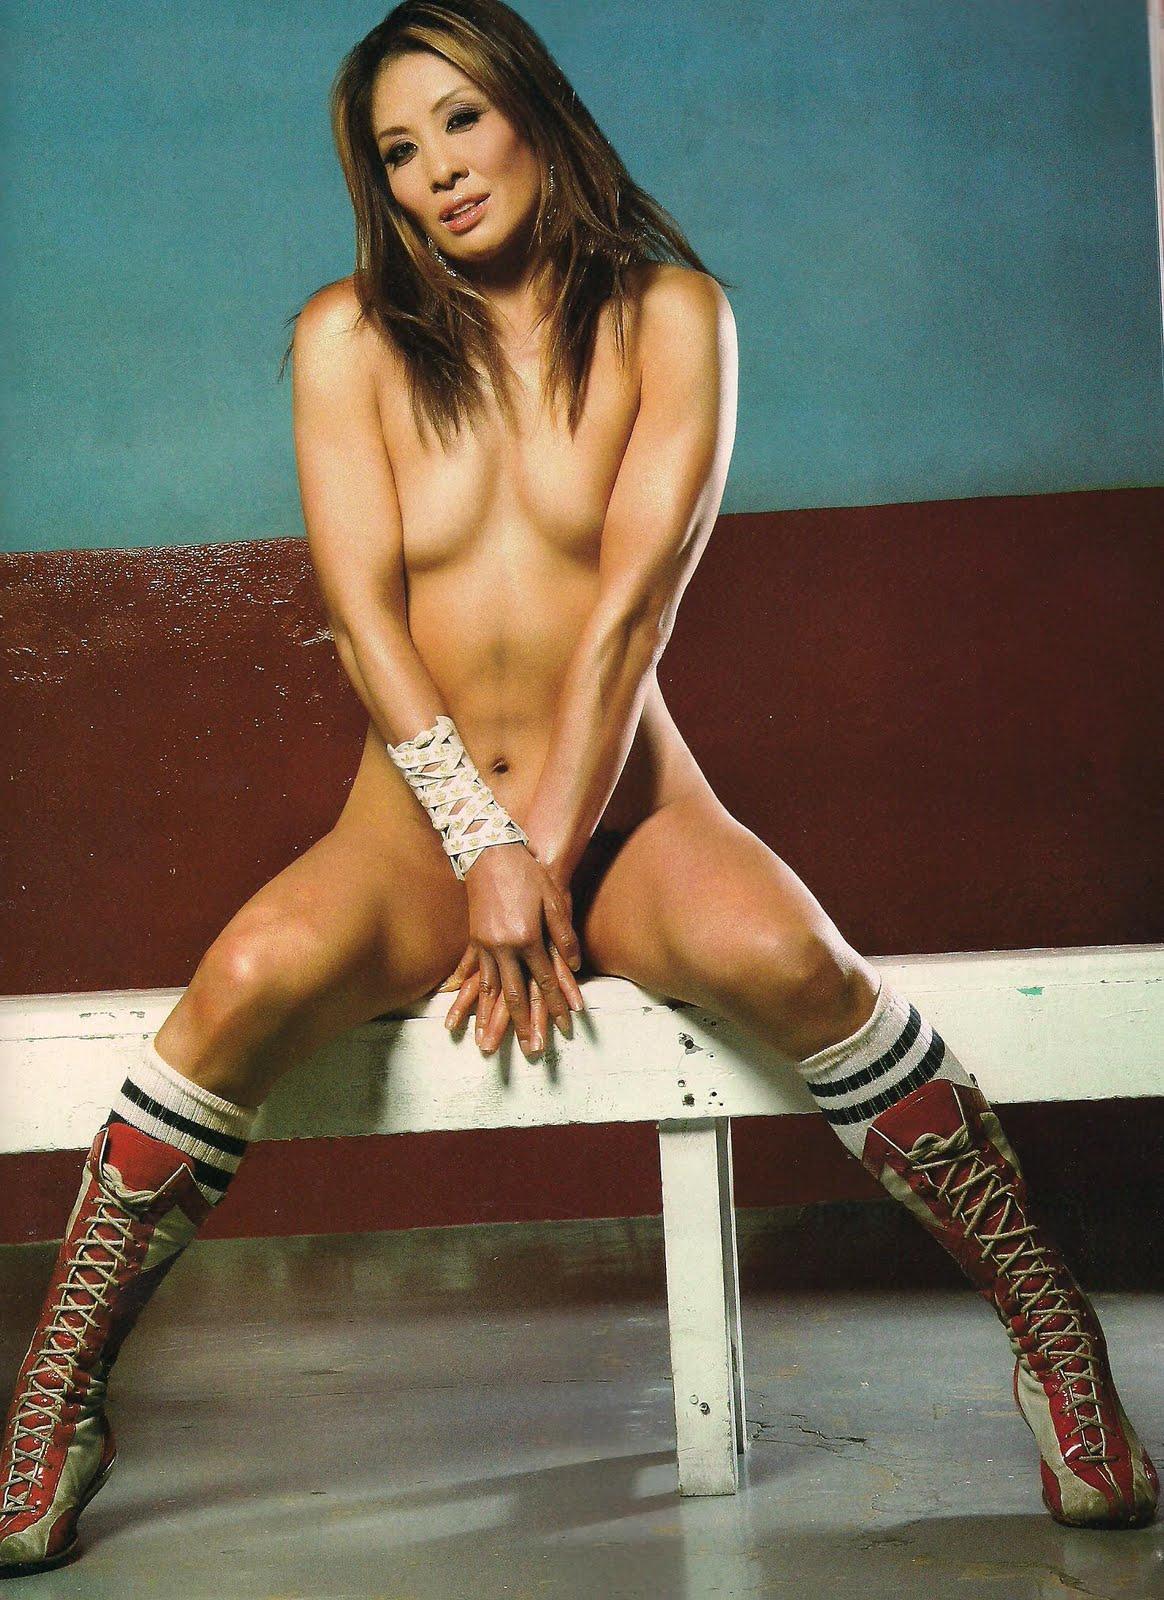 Jill monroe lucha desnuda